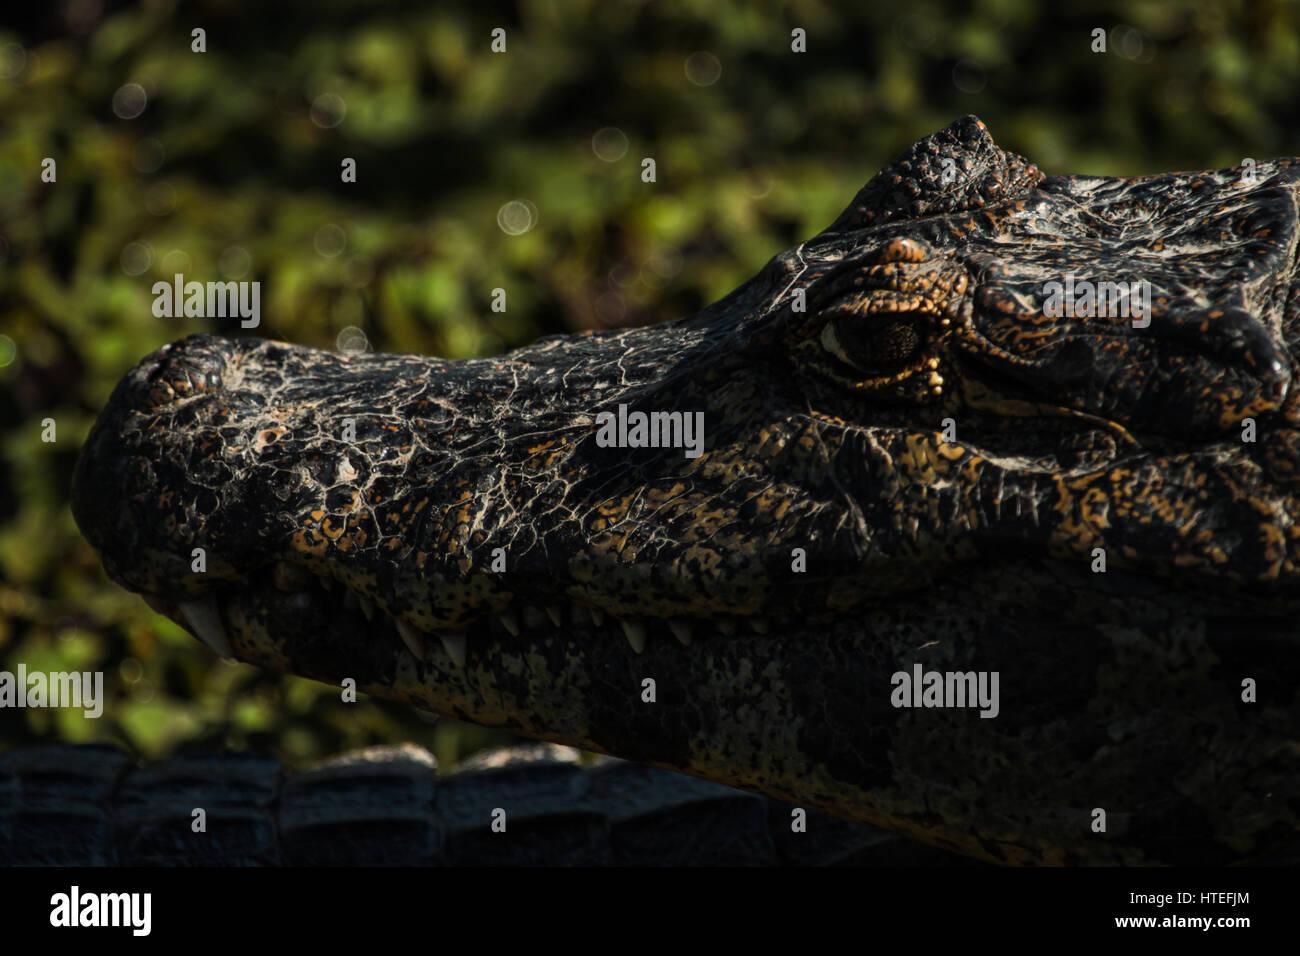 Broad-snouted caiman (Caiman latirostris) - crocodilian reptile - Travel: Pantanal - Mato Grosso - Brazil - Stock Image